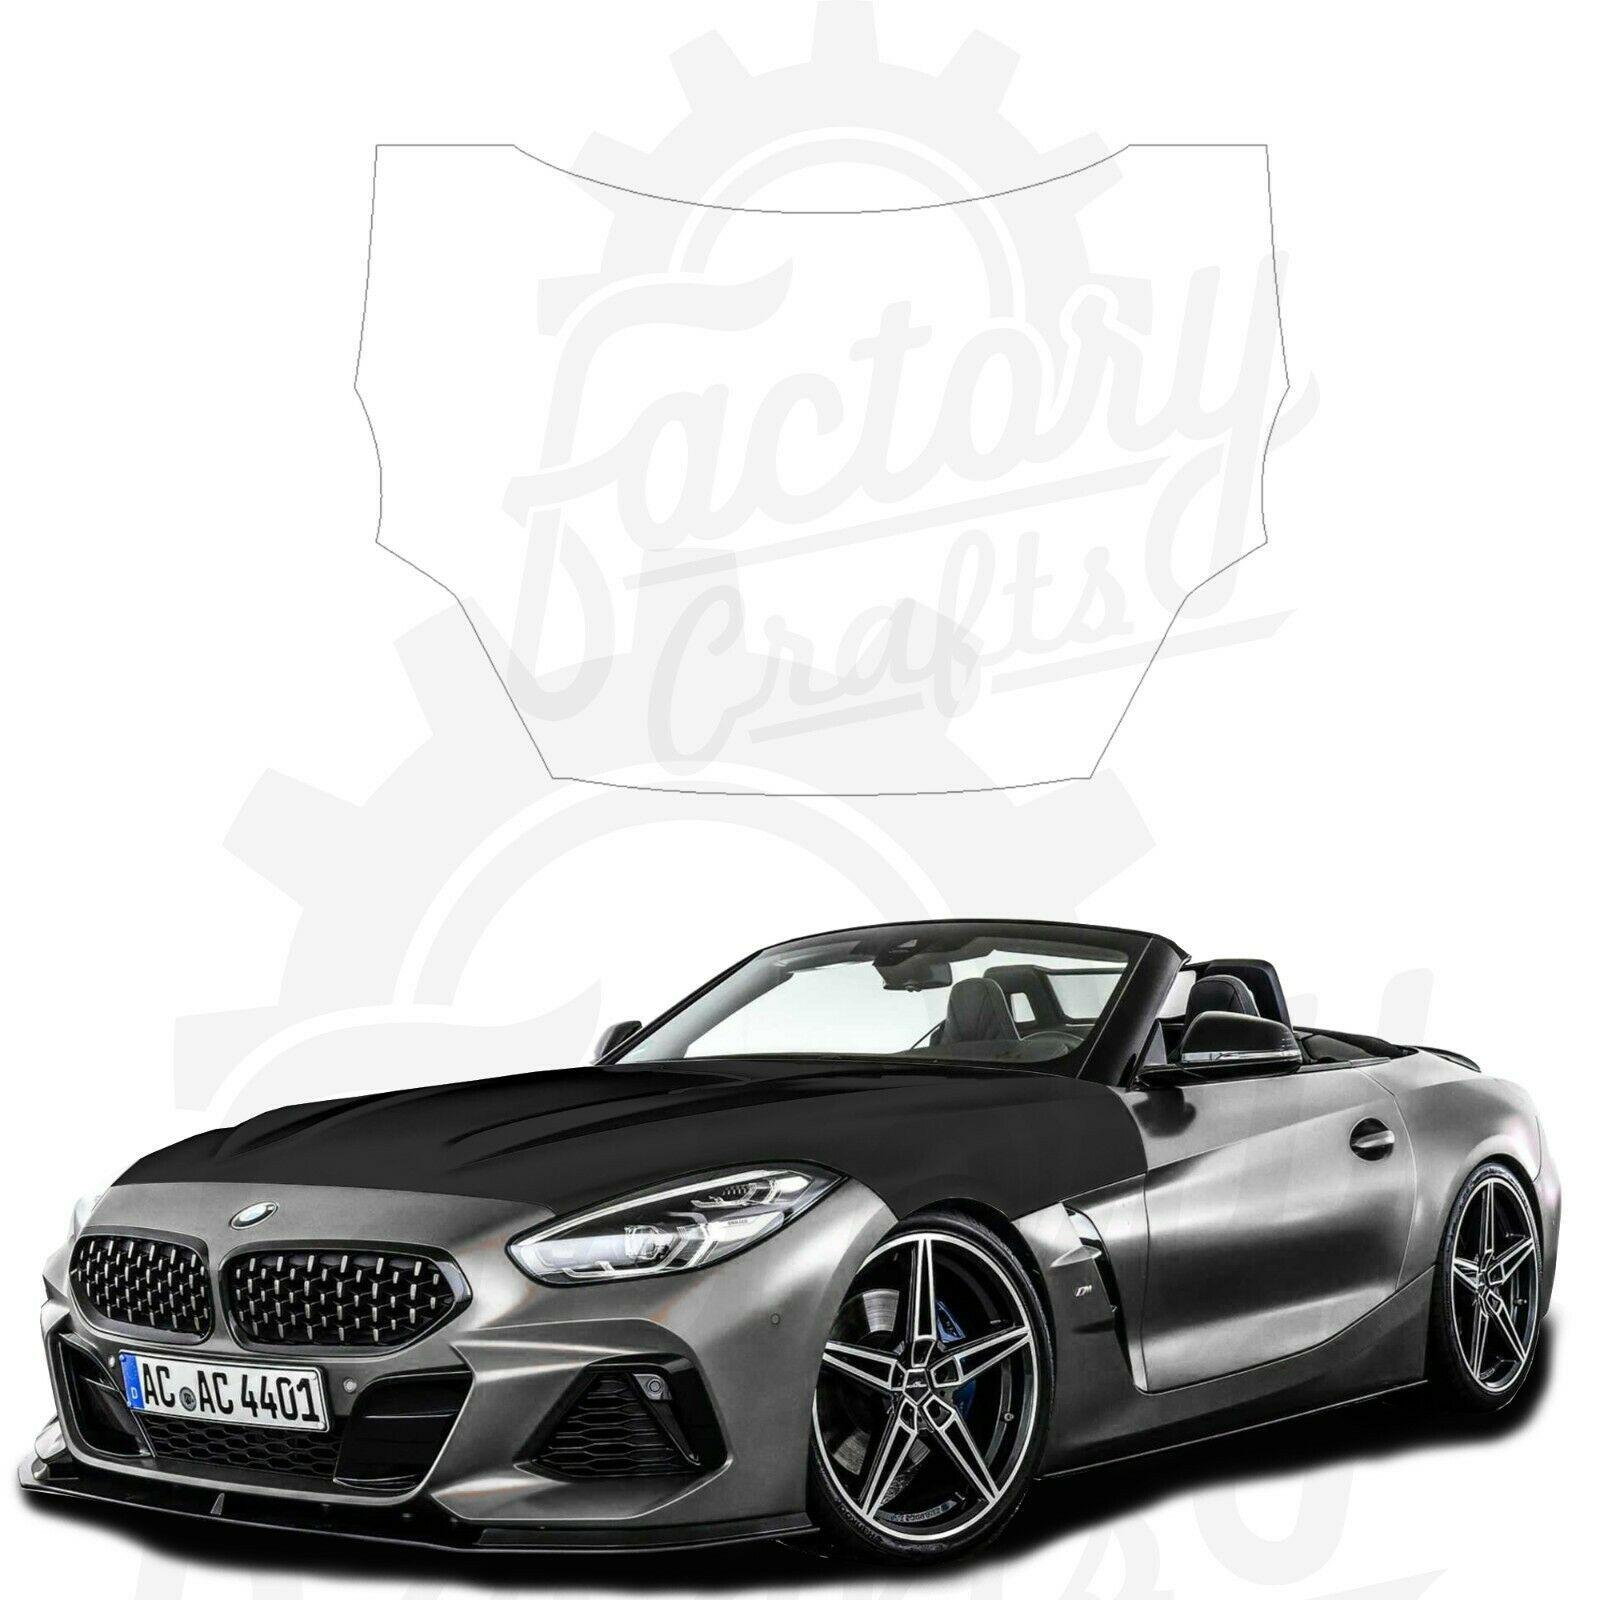 Matte Black Vinyl Decal Hood Wrap for BMW Z4 M40i 2020 - $247.45